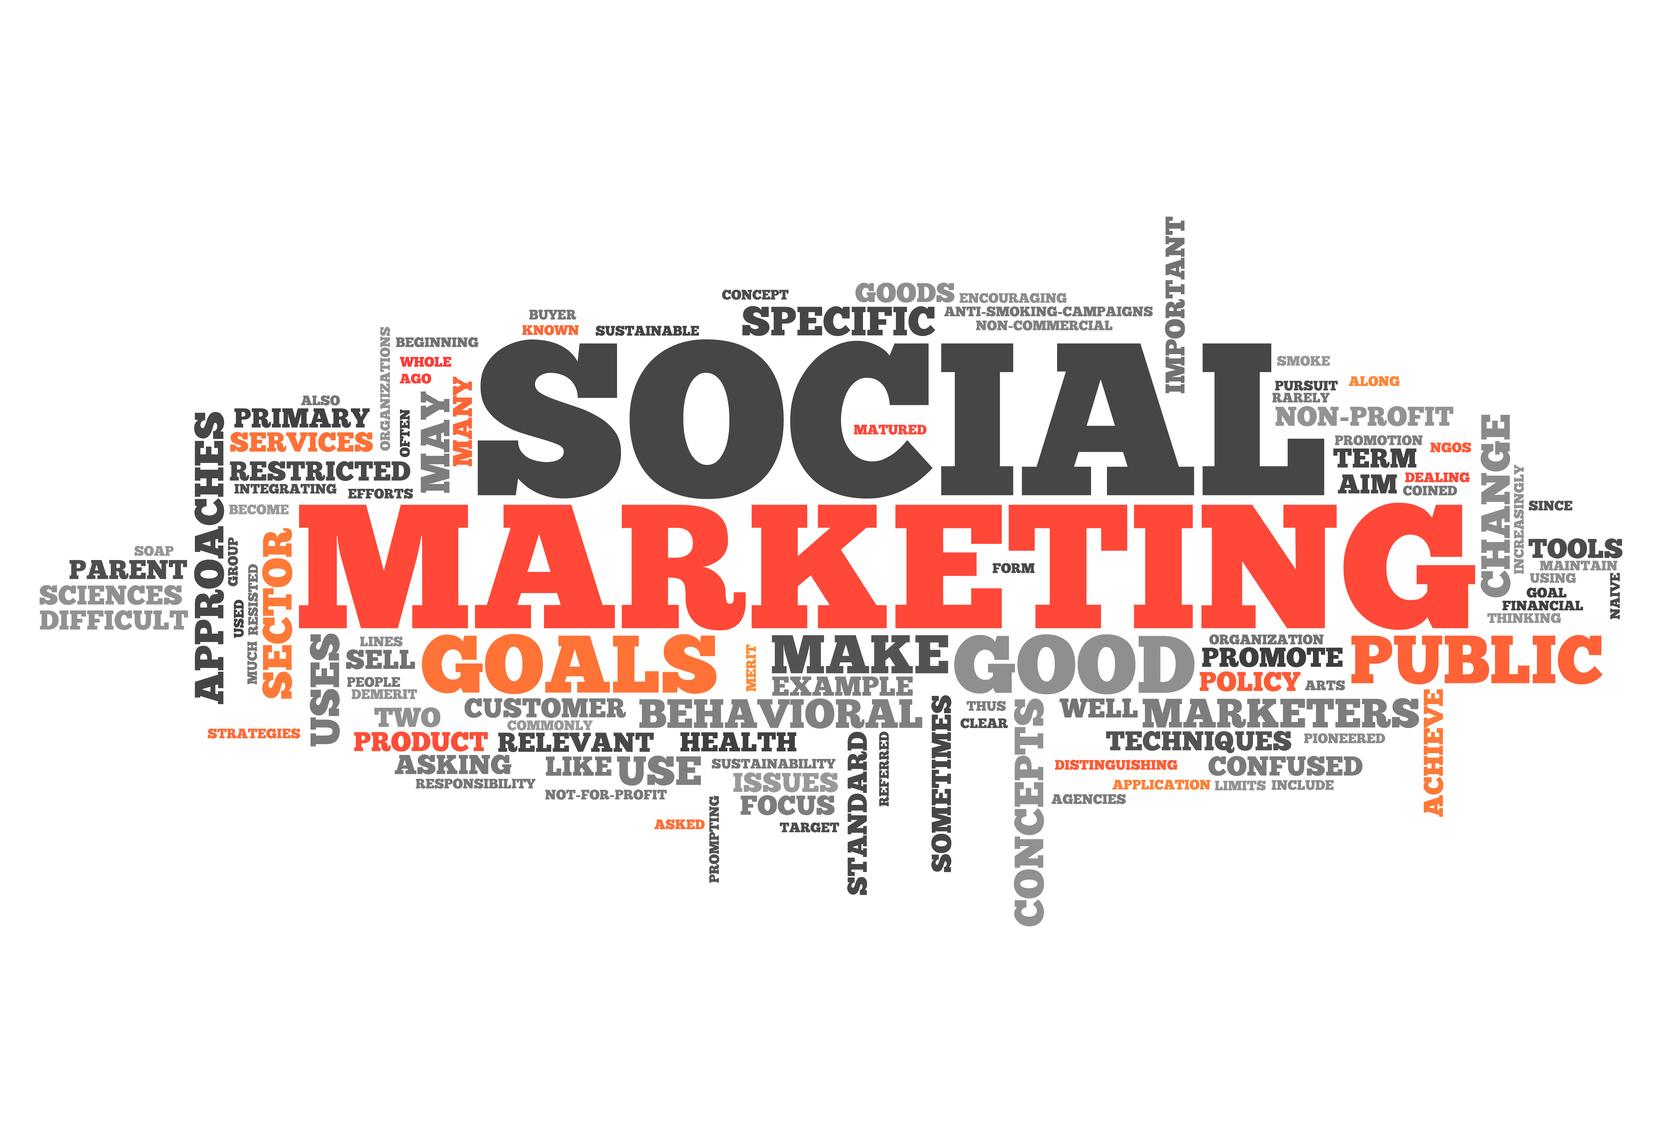 autoketing-marketing-idea-social-platforms-3